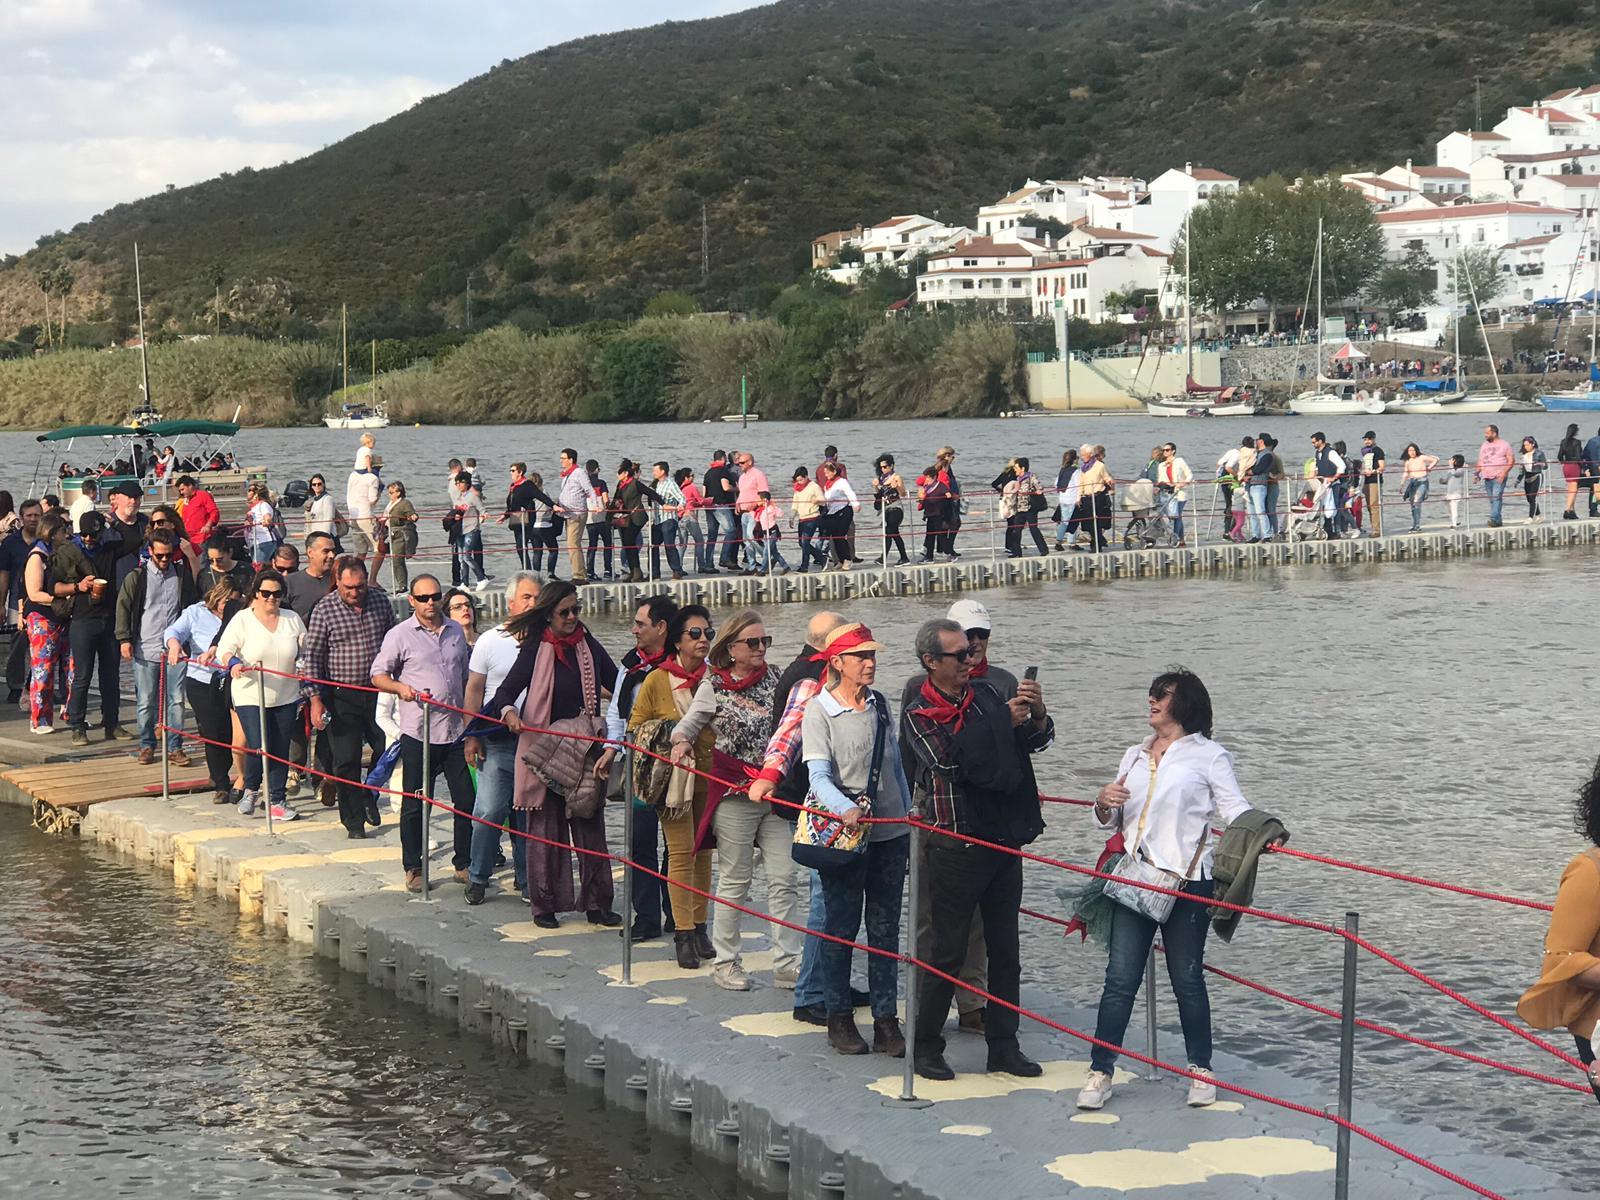 Puente-flotante-pasarela-flotante-feria-contrabando-Unibis19